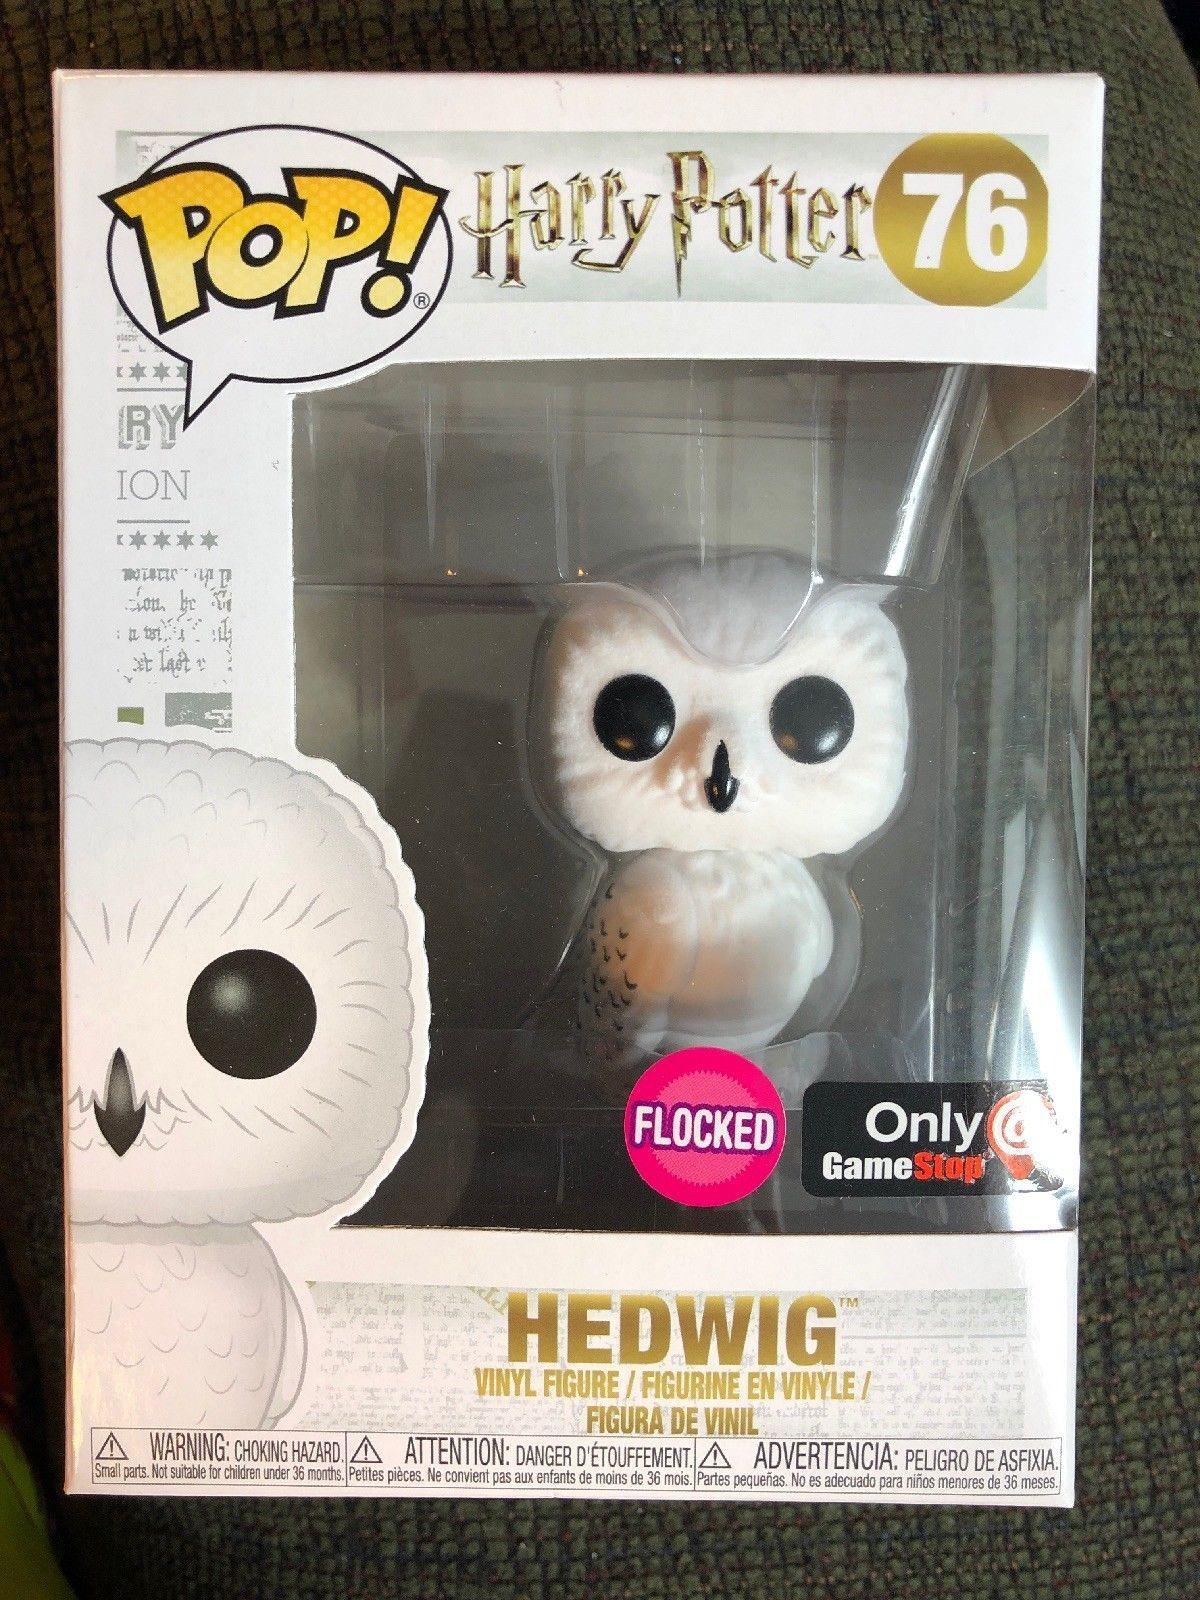 FUNKO POP HARRY POTTER 76 HEDWIG OWL VINYL FIGURE FIGURINE